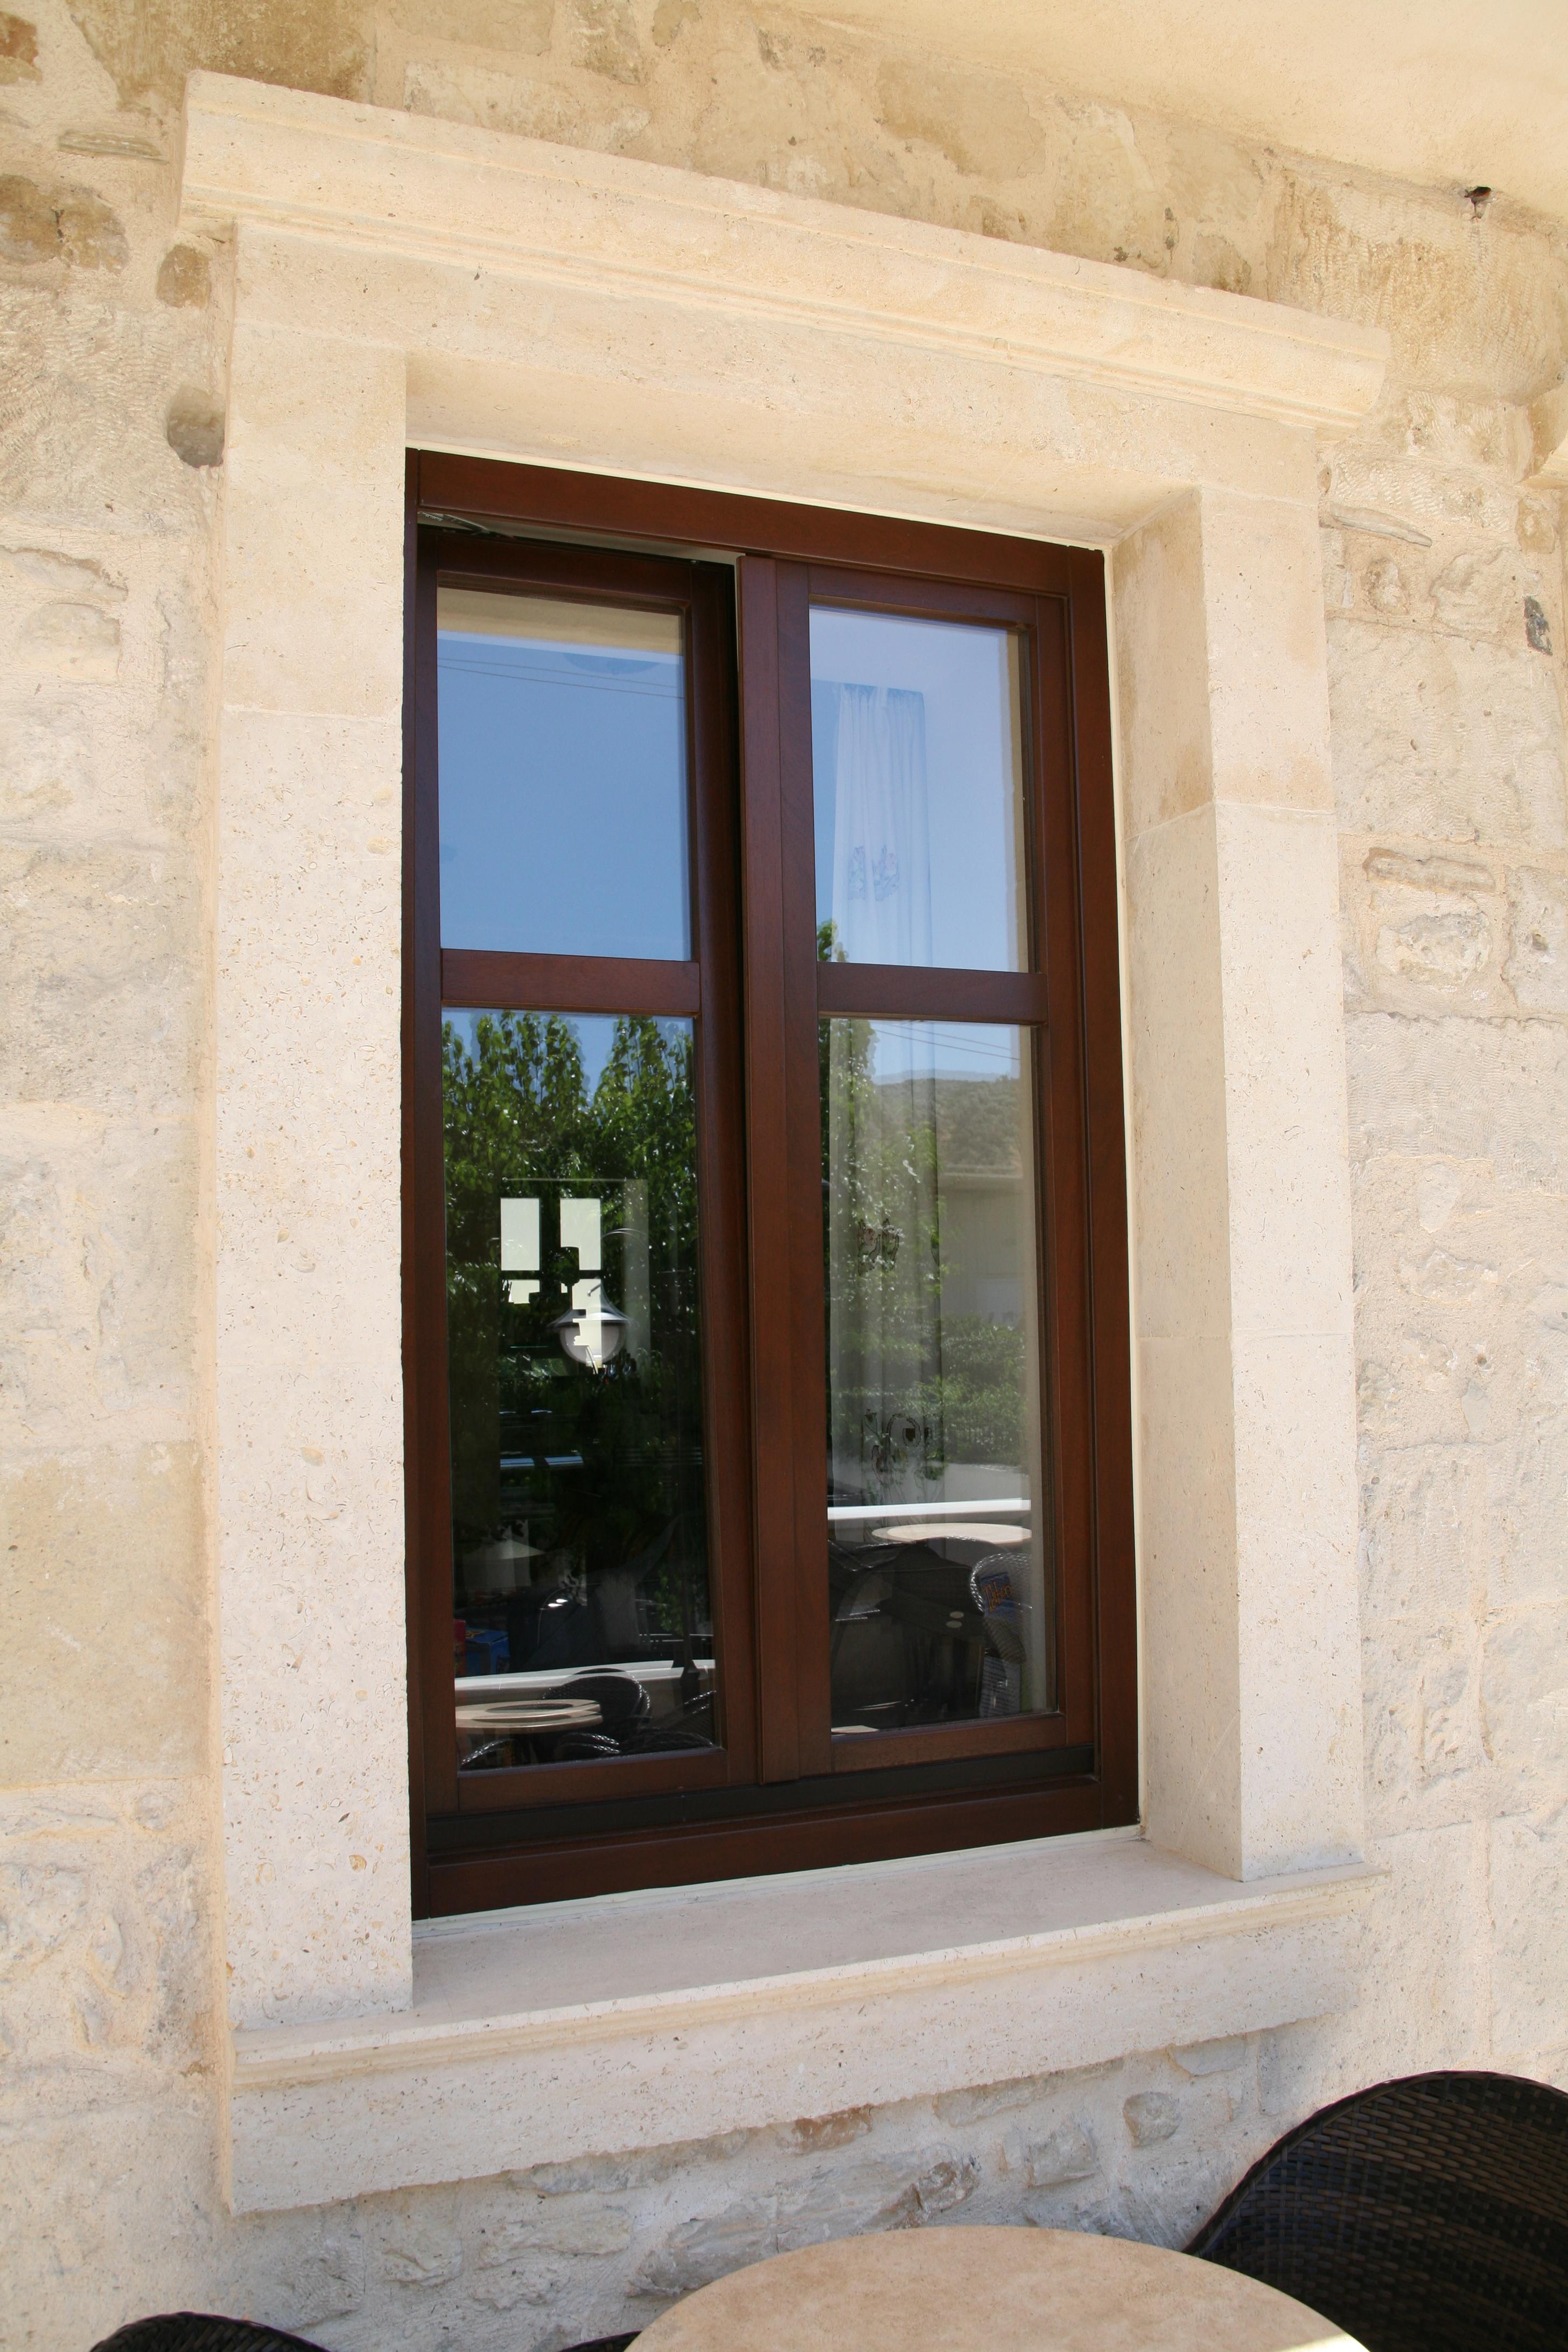 Reclining window